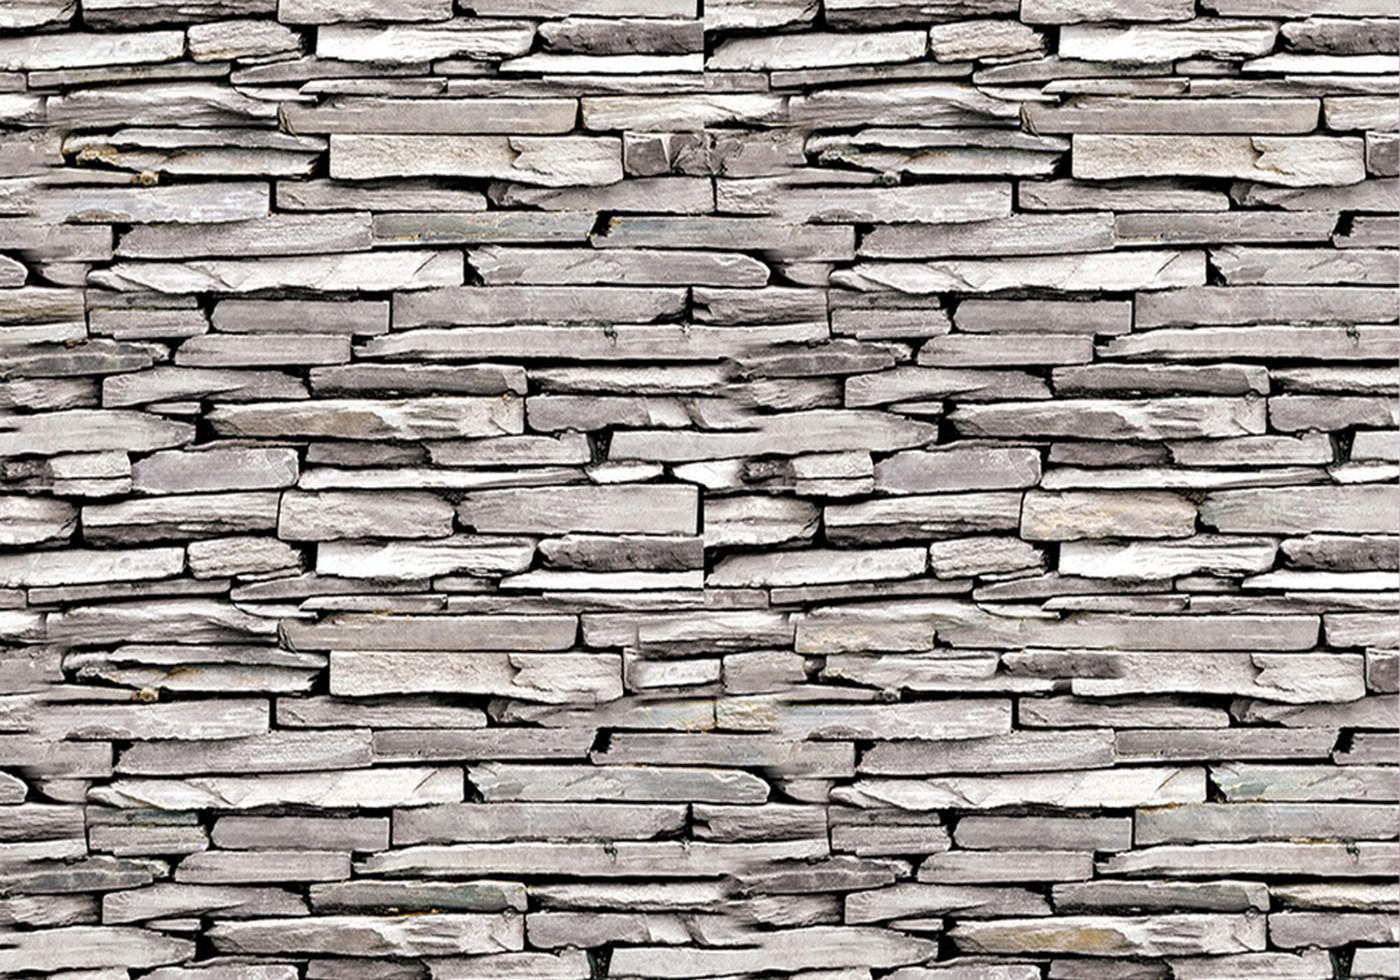 Vlies Fototapete 424   Steinwand Tapete Steinwand Steine Muster Mauer Grau  Grau